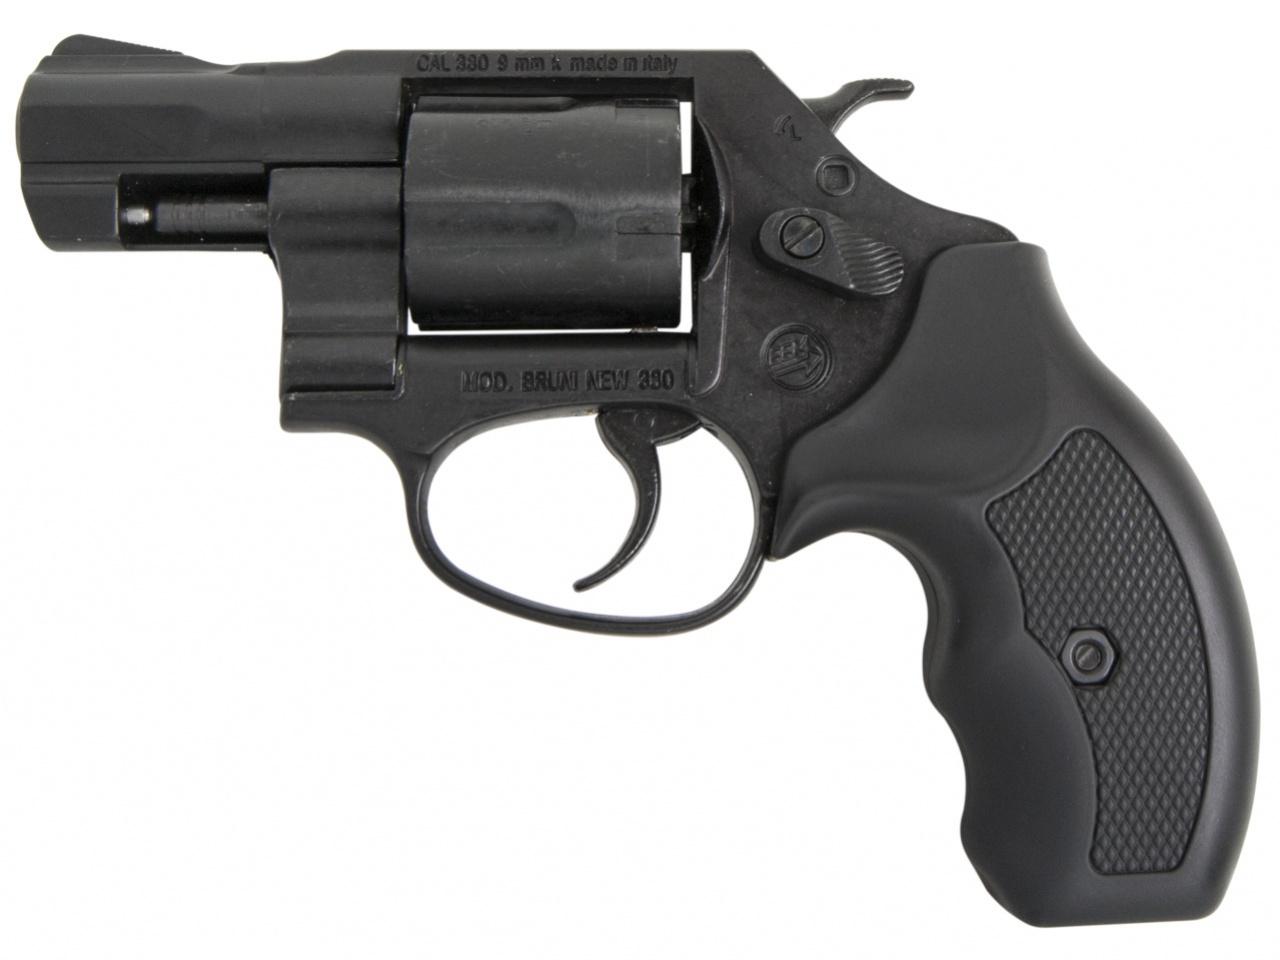 Plynový revolver Bruni NEW 380 Python 2